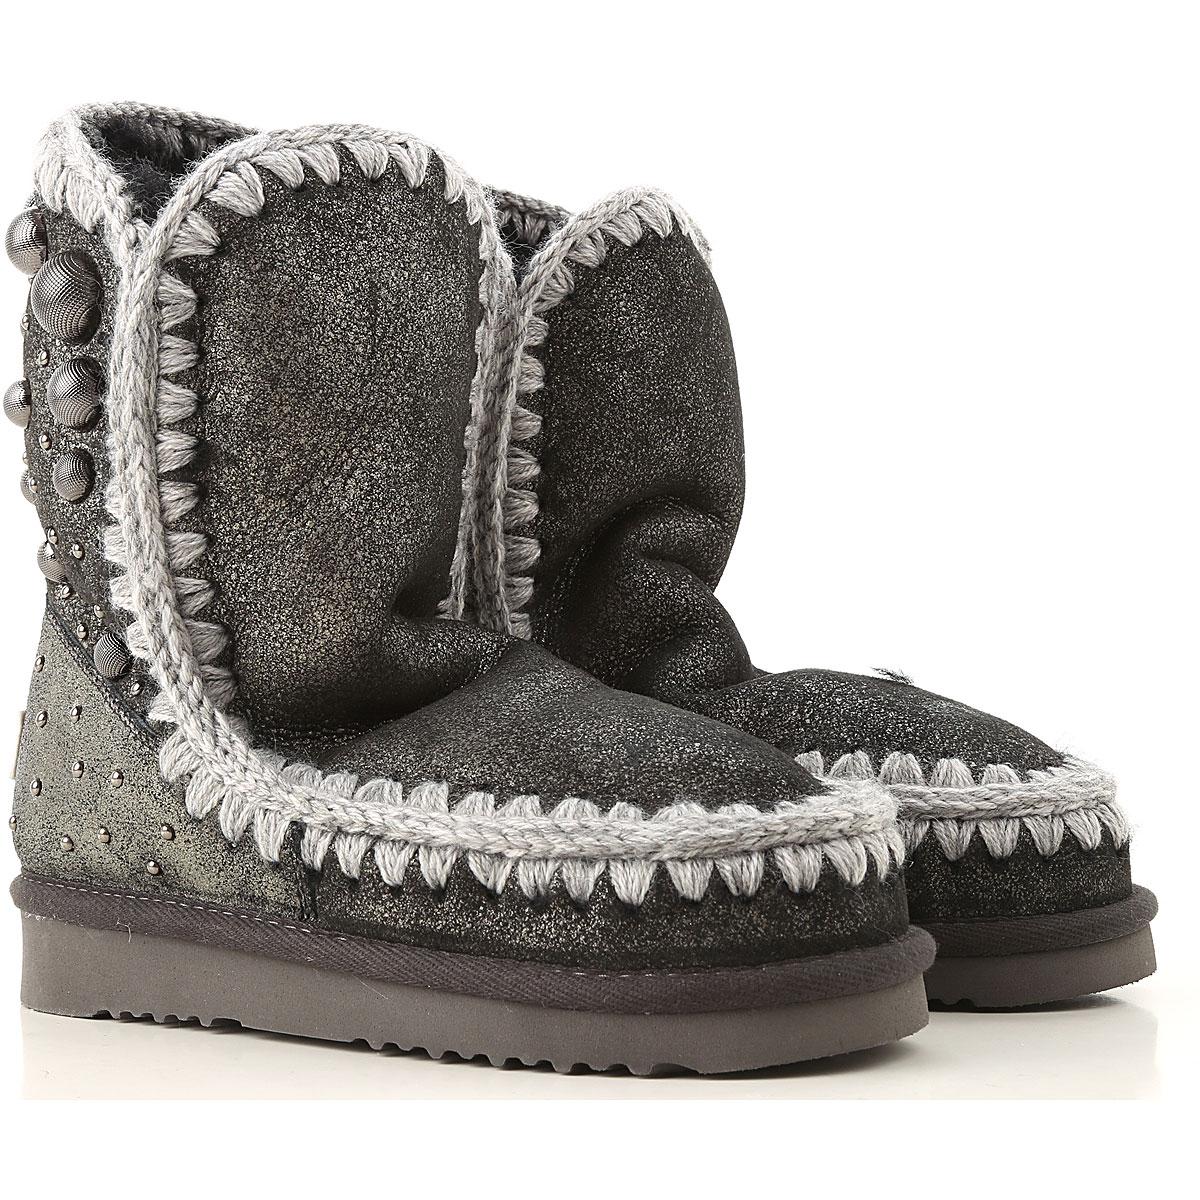 Image of Mou Boots for Women, Booties, Asphalt Grey, Leather, 2017, EUR 36 - UK 3 - USA 5.5 EUR 37 - UK 4 - USA 6.5 EUR 38 - UK 5 - USA 7.5 EUR 39 - UK 6 - USA 8.5 EUR 40 - UK 7 - USA 9.5